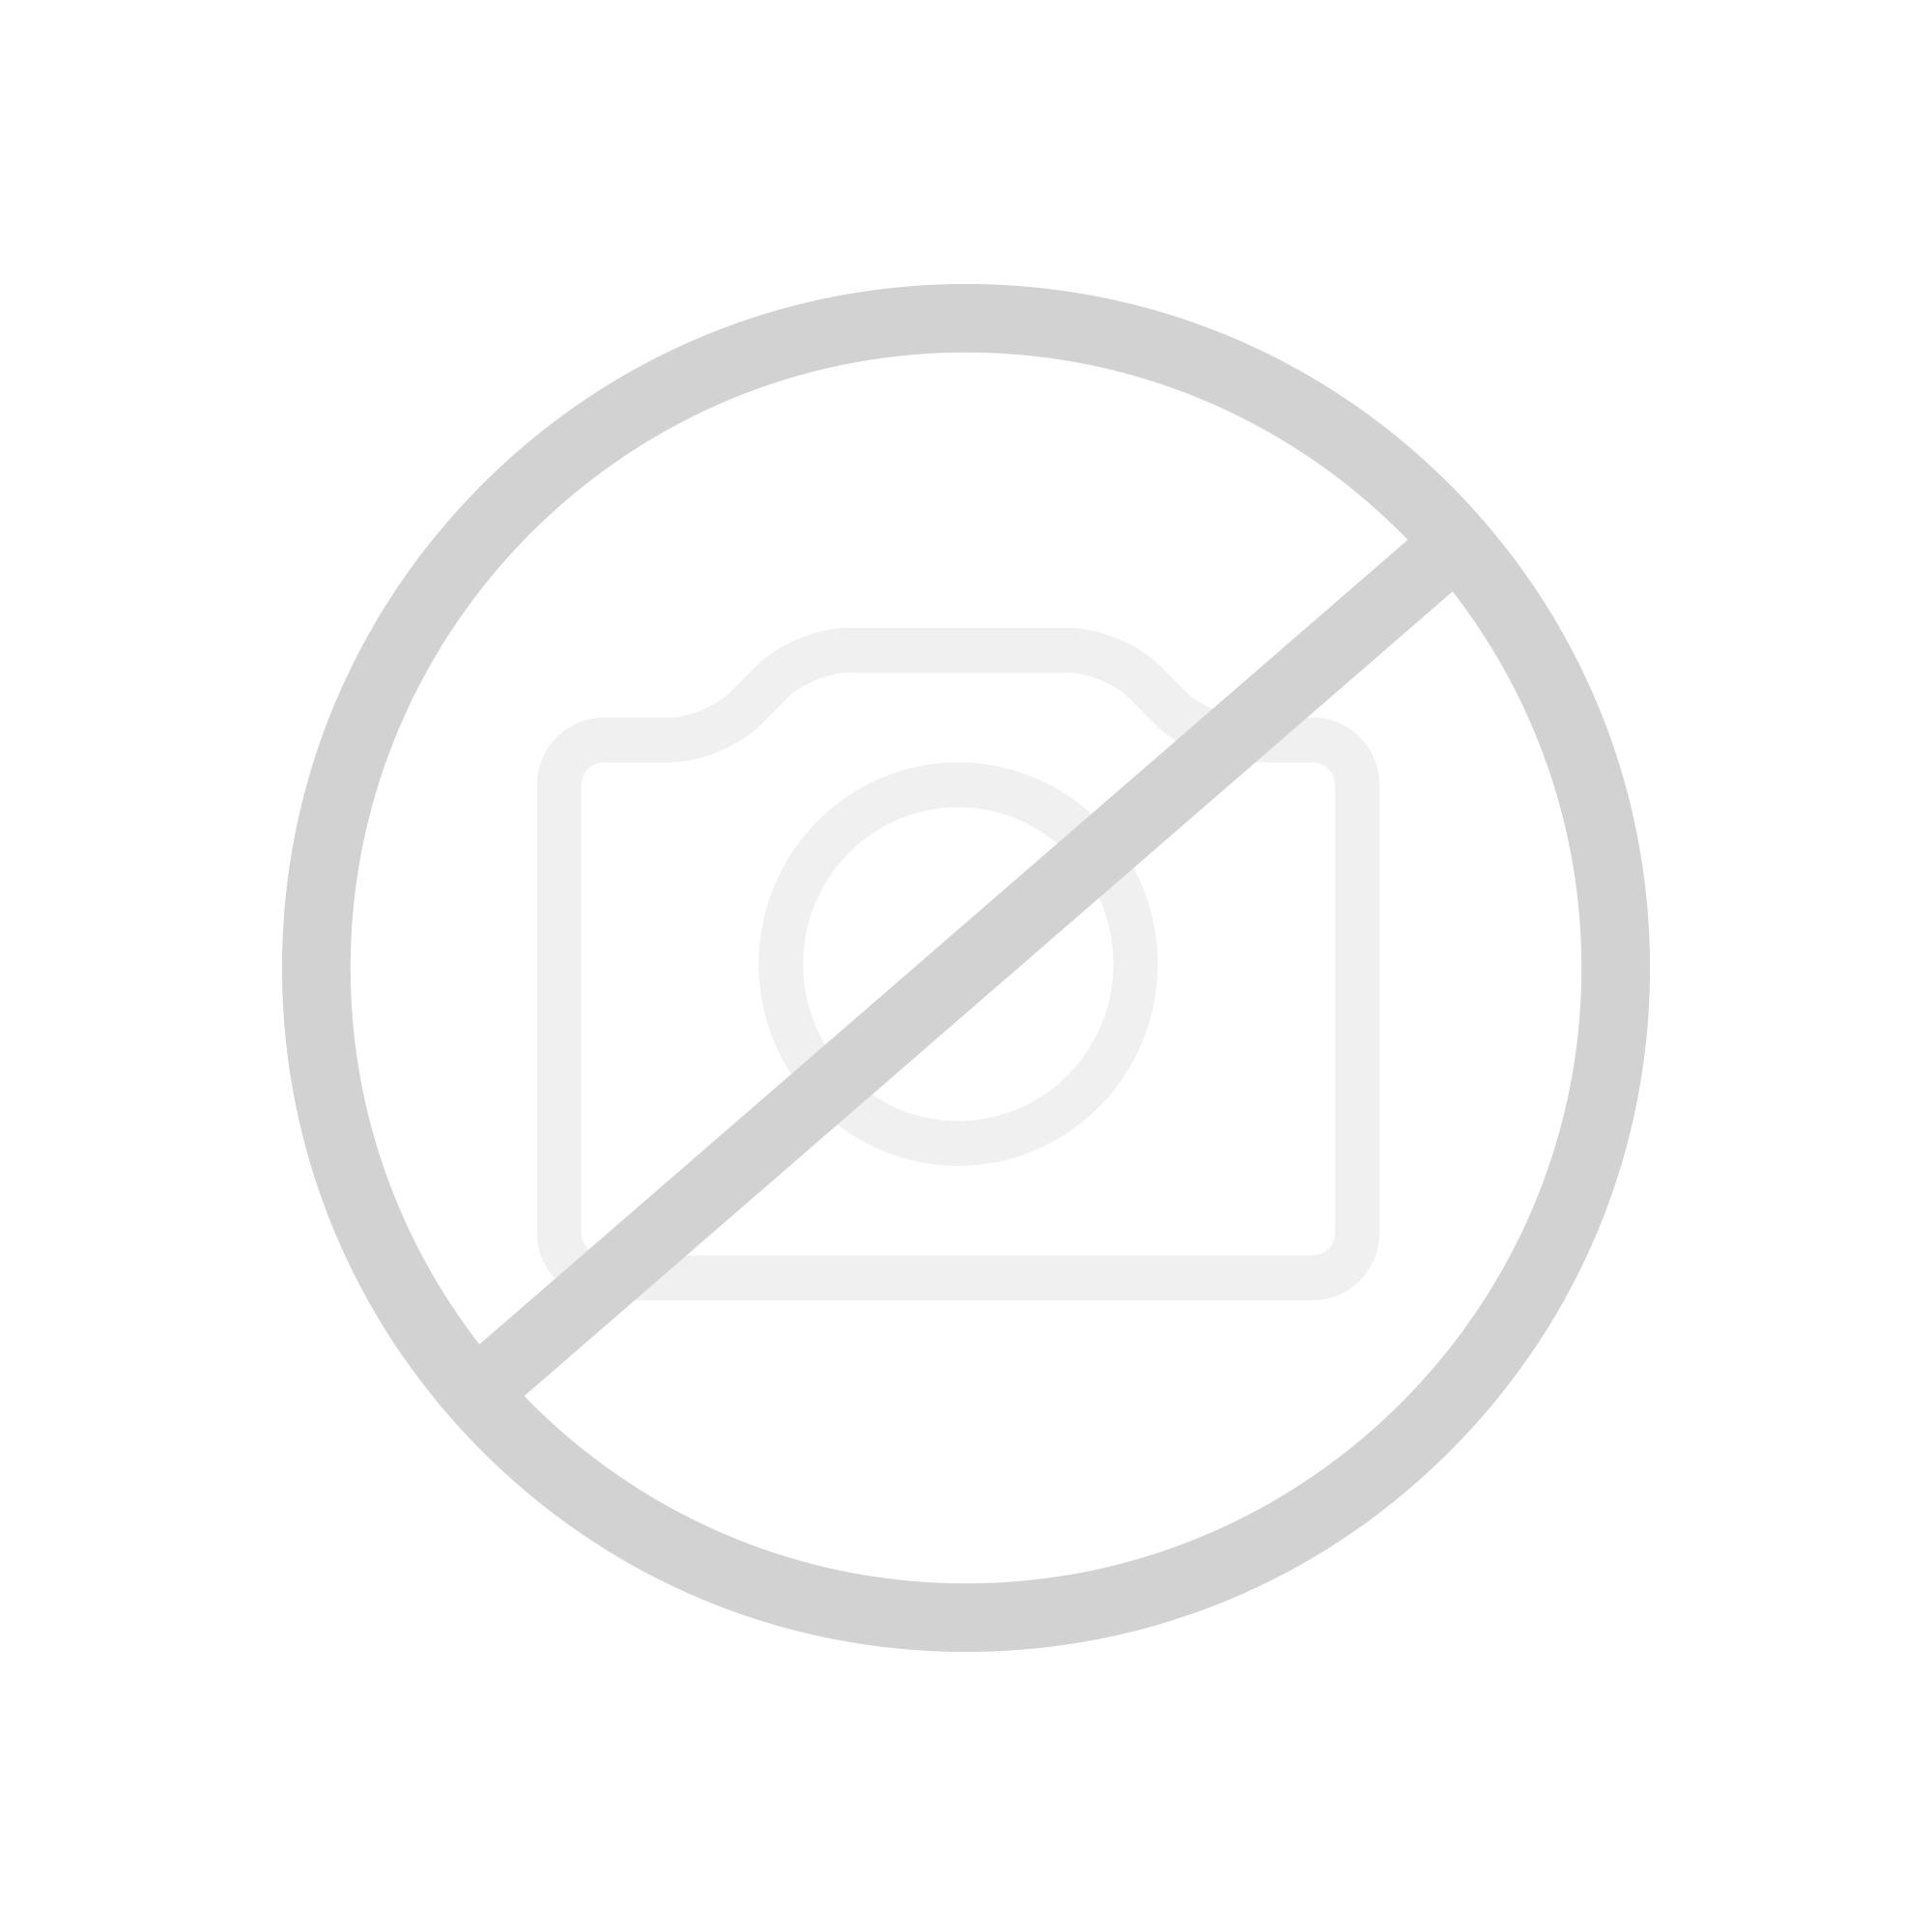 Hansgrohe Raindance Select Showerpipe 240, DN15